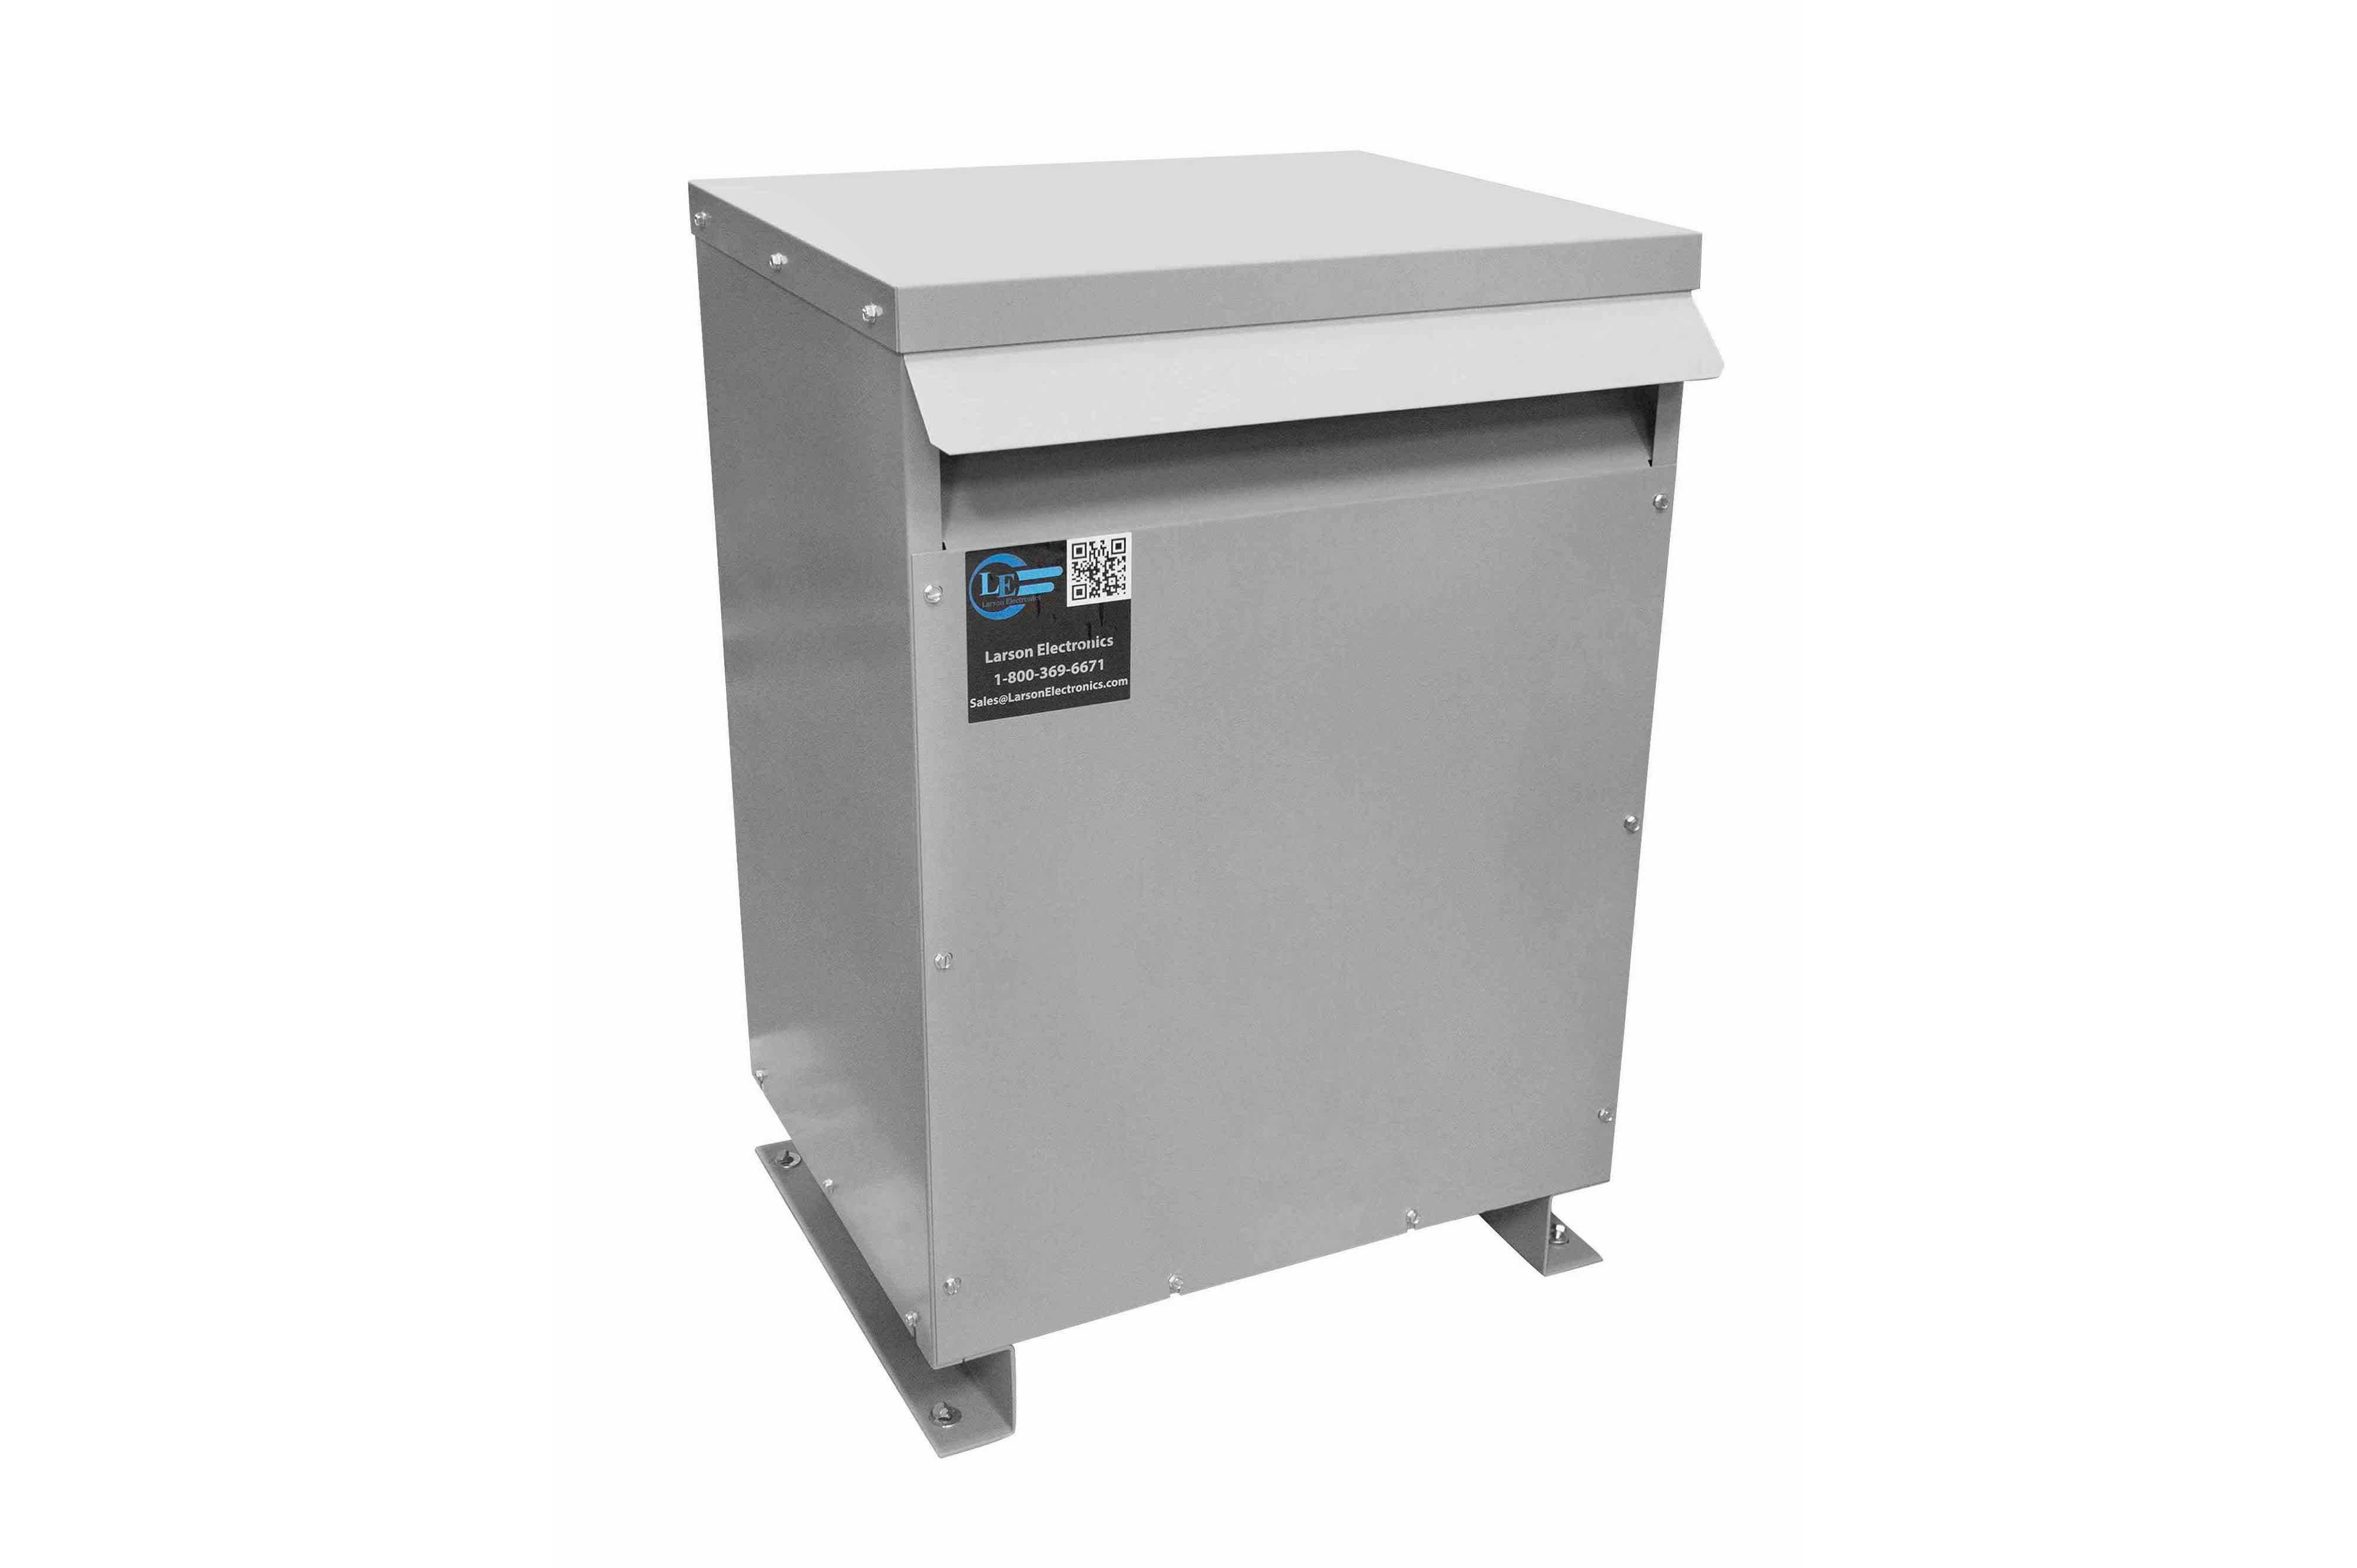 1000 kVA 3PH Isolation Transformer, 600V Wye Primary, 400Y/231 Wye-N Secondary, N3R, Ventilated, 60 Hz